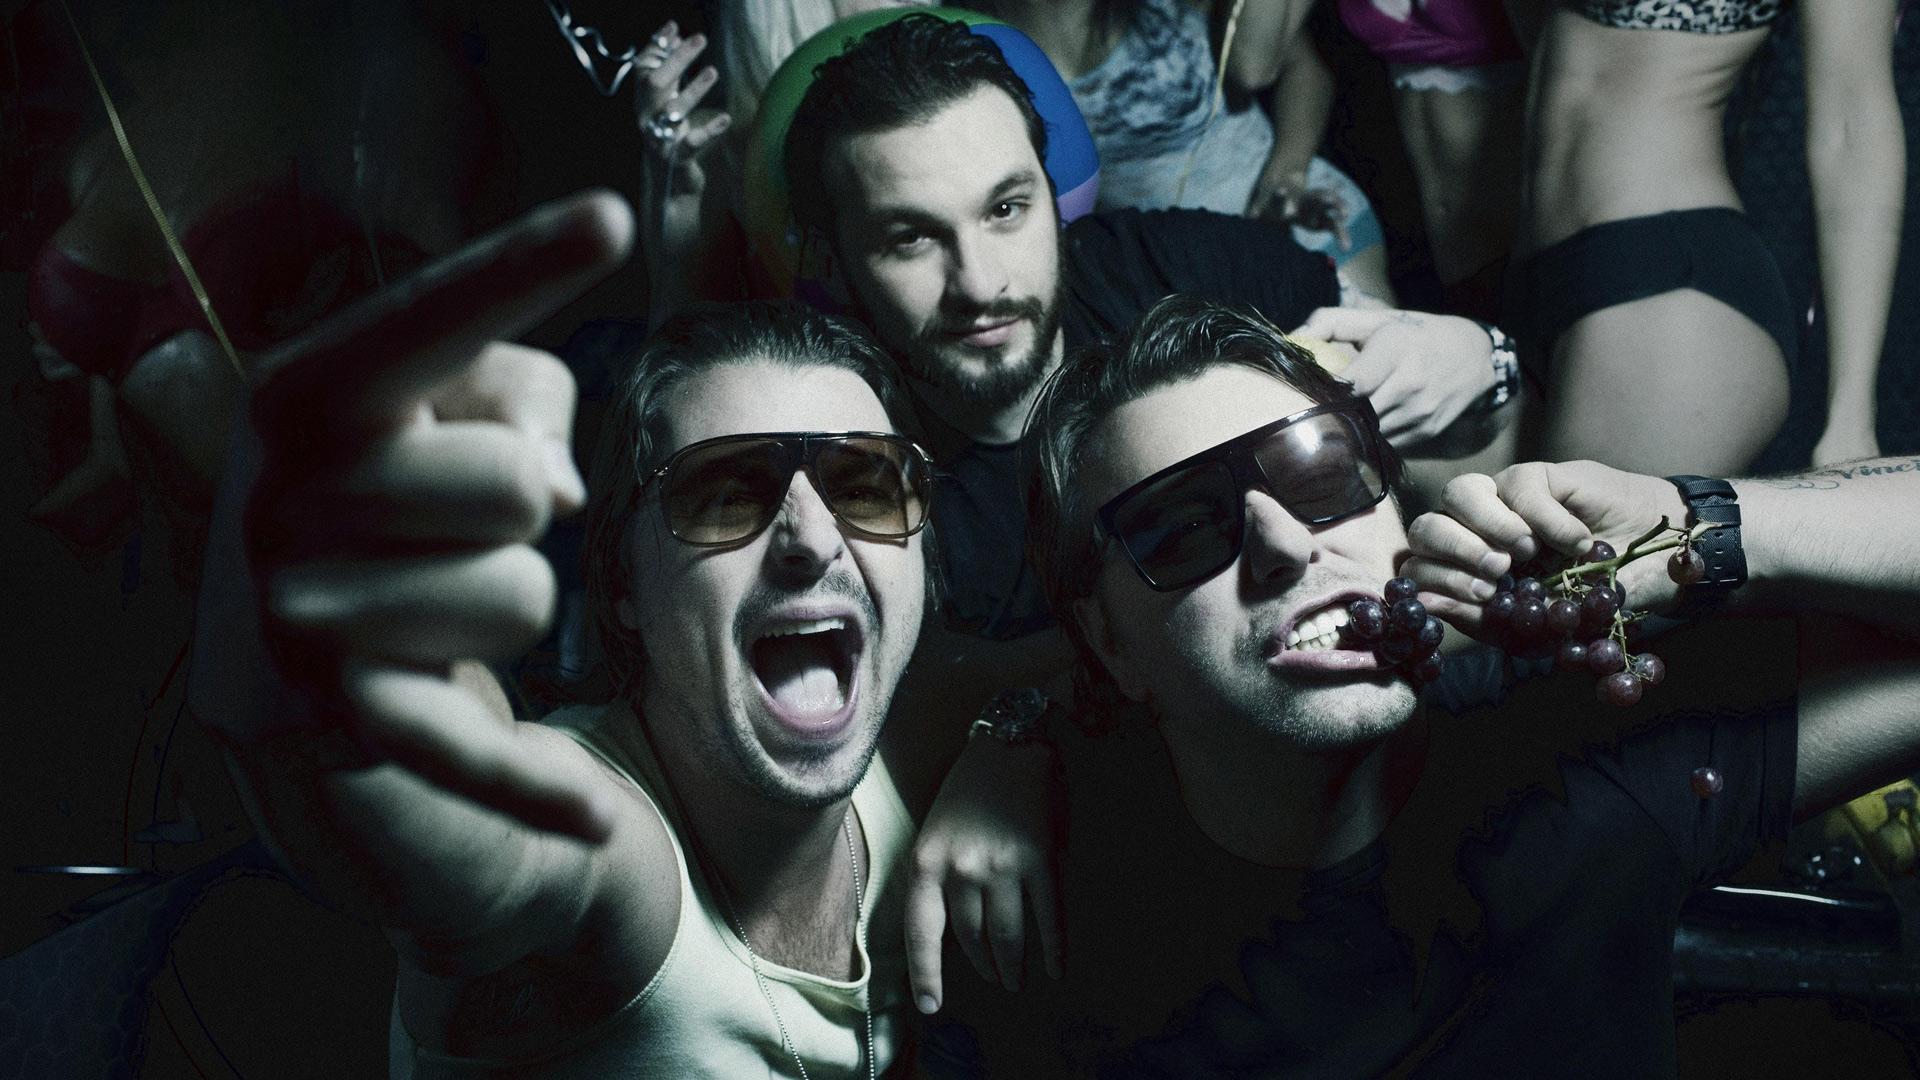 Save The World av Swedish House Mafia